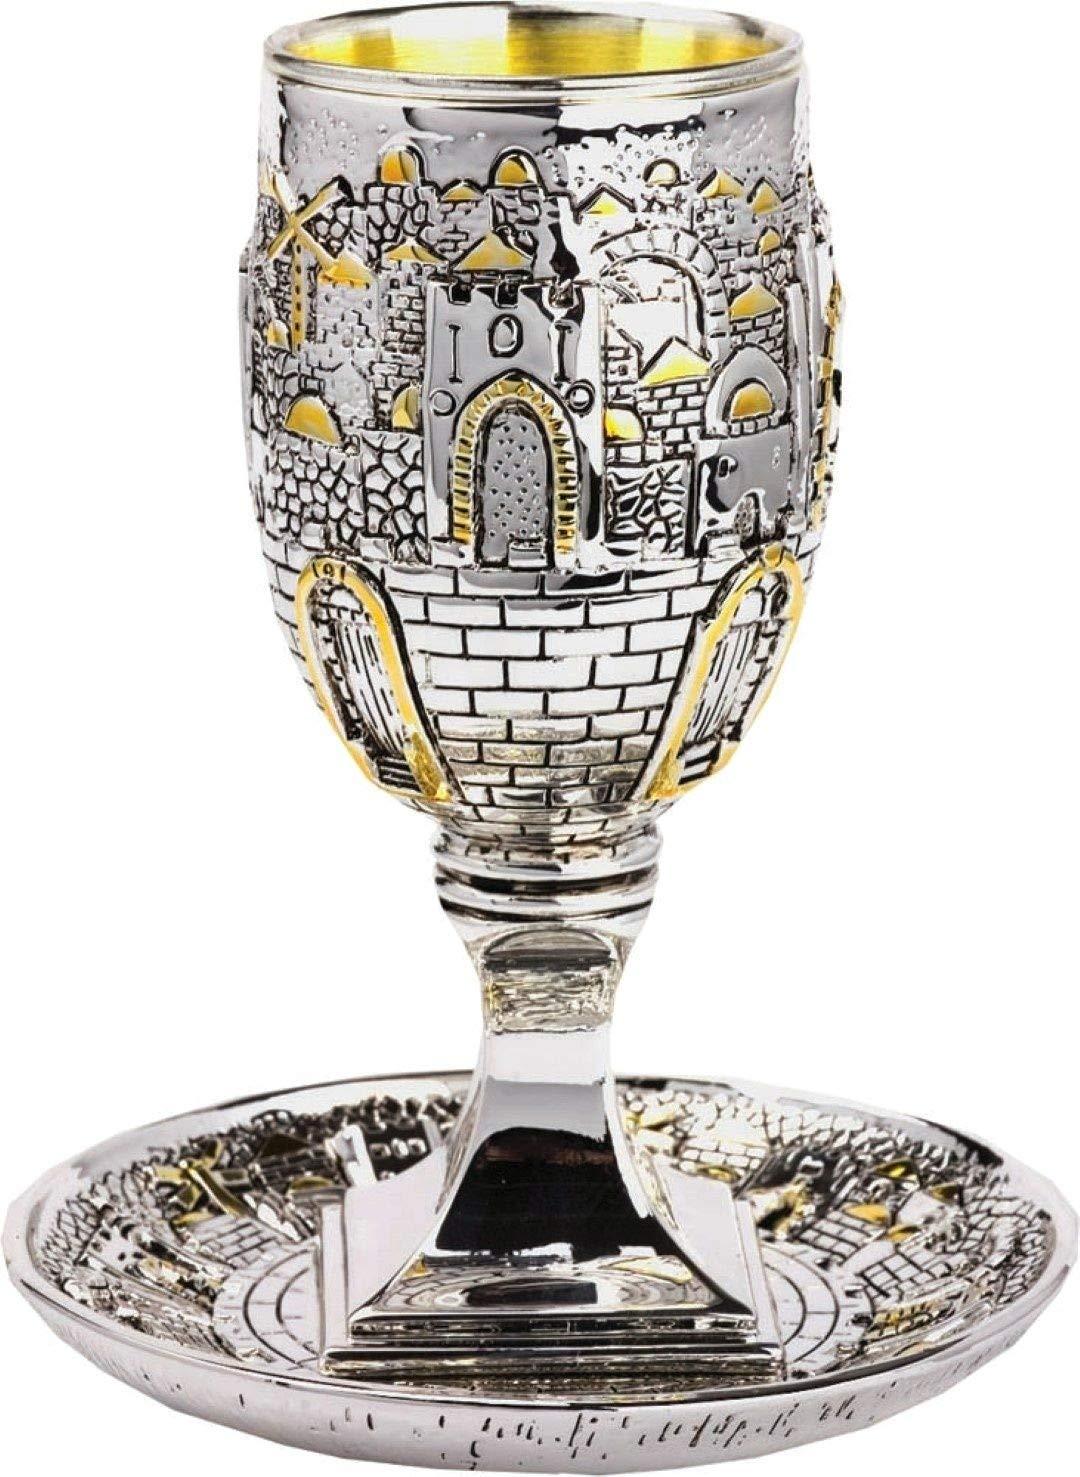 Silver Plated KIDDUSH CUP with Matching Tray Jewish Shabbat Set Jerusalem Of Gold Israel Judaica Gift